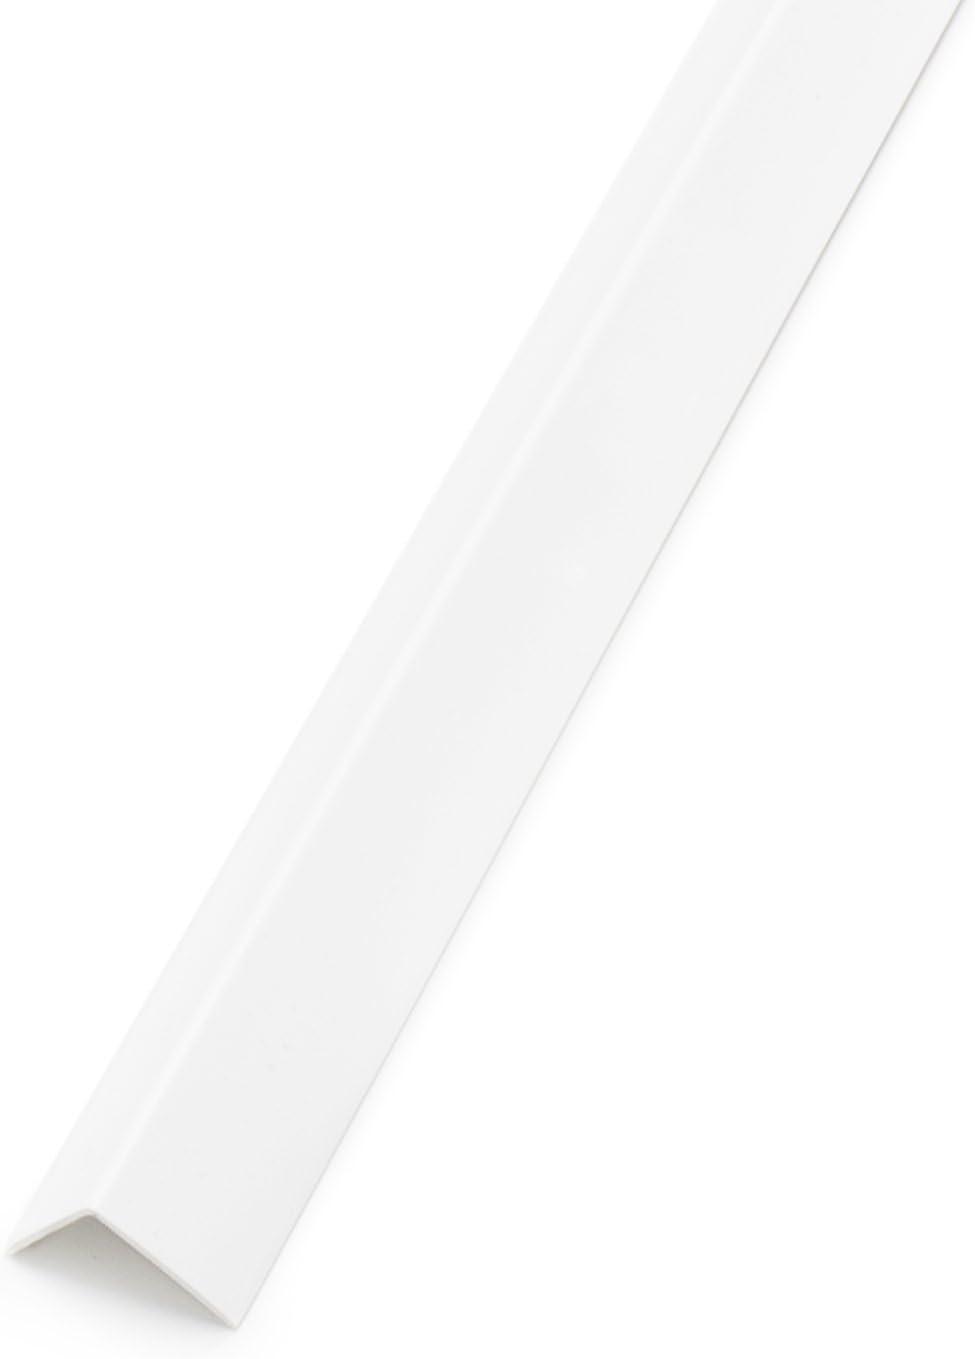 25x25mm Eiche Winkelleiste PVC Winkelprofil Kunststoffwinkelprofil Kunststoff-Profil 1m DQ-PP